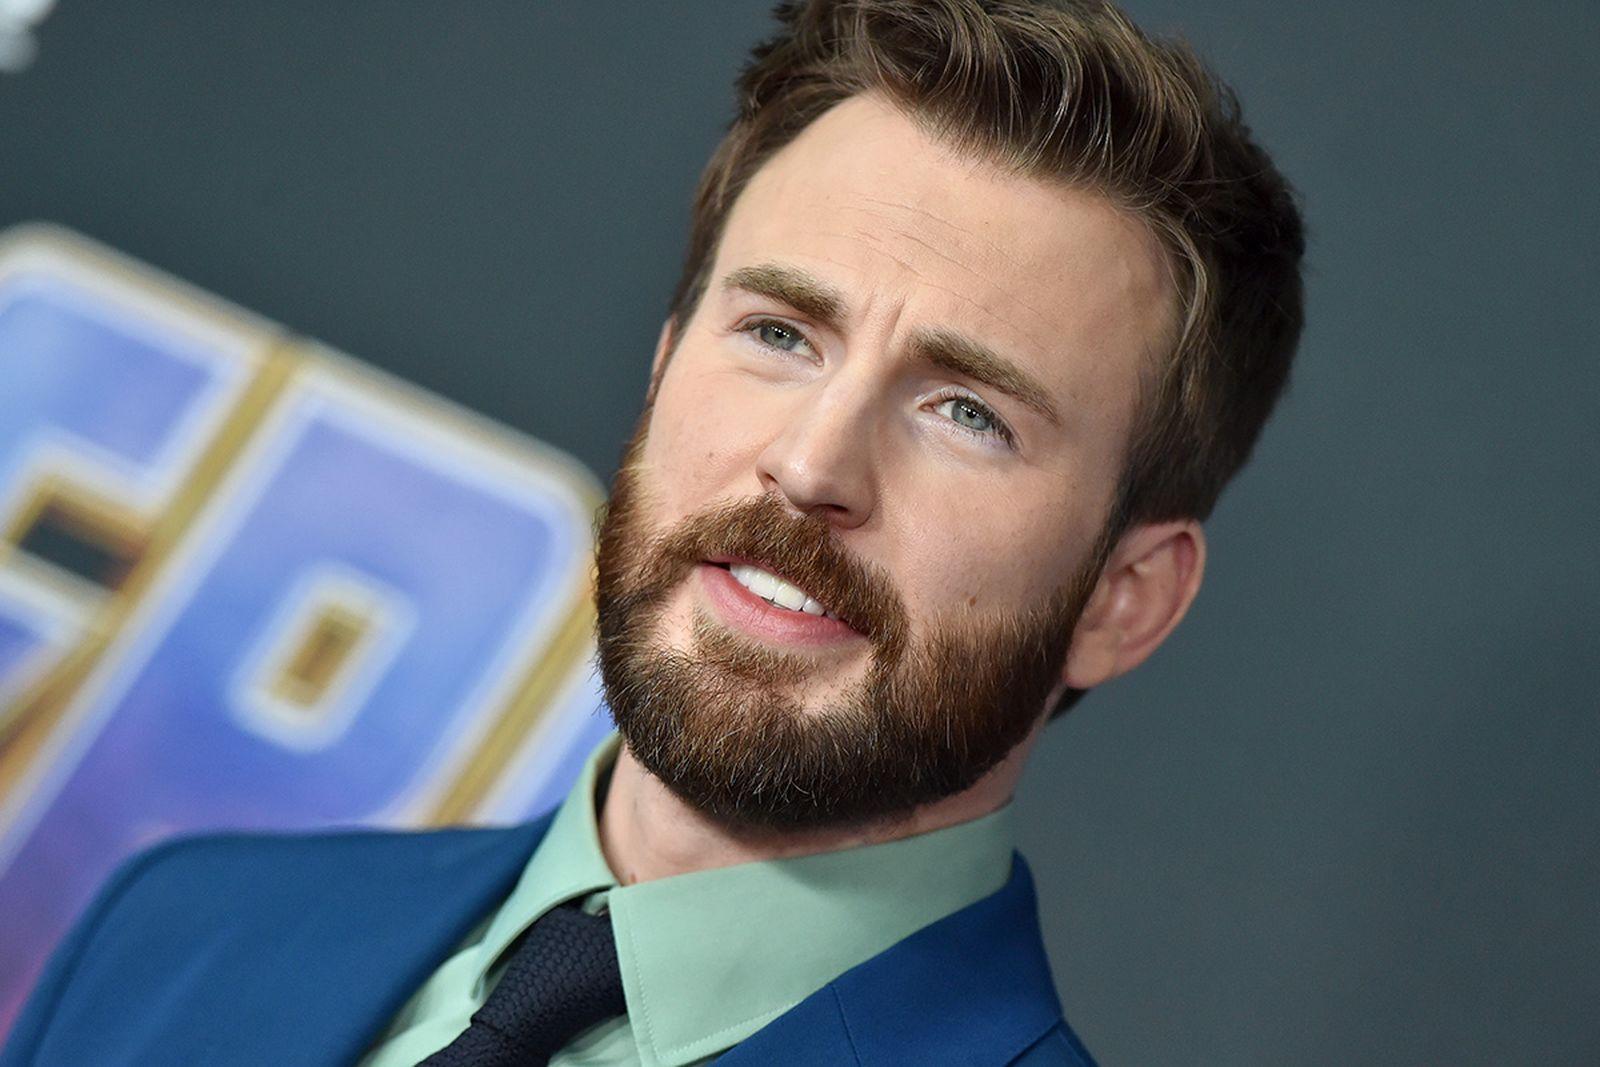 Chris Evans attends the World Premiere of Walt Disney Studios Motion Pictures 'Avengers: Endgame'